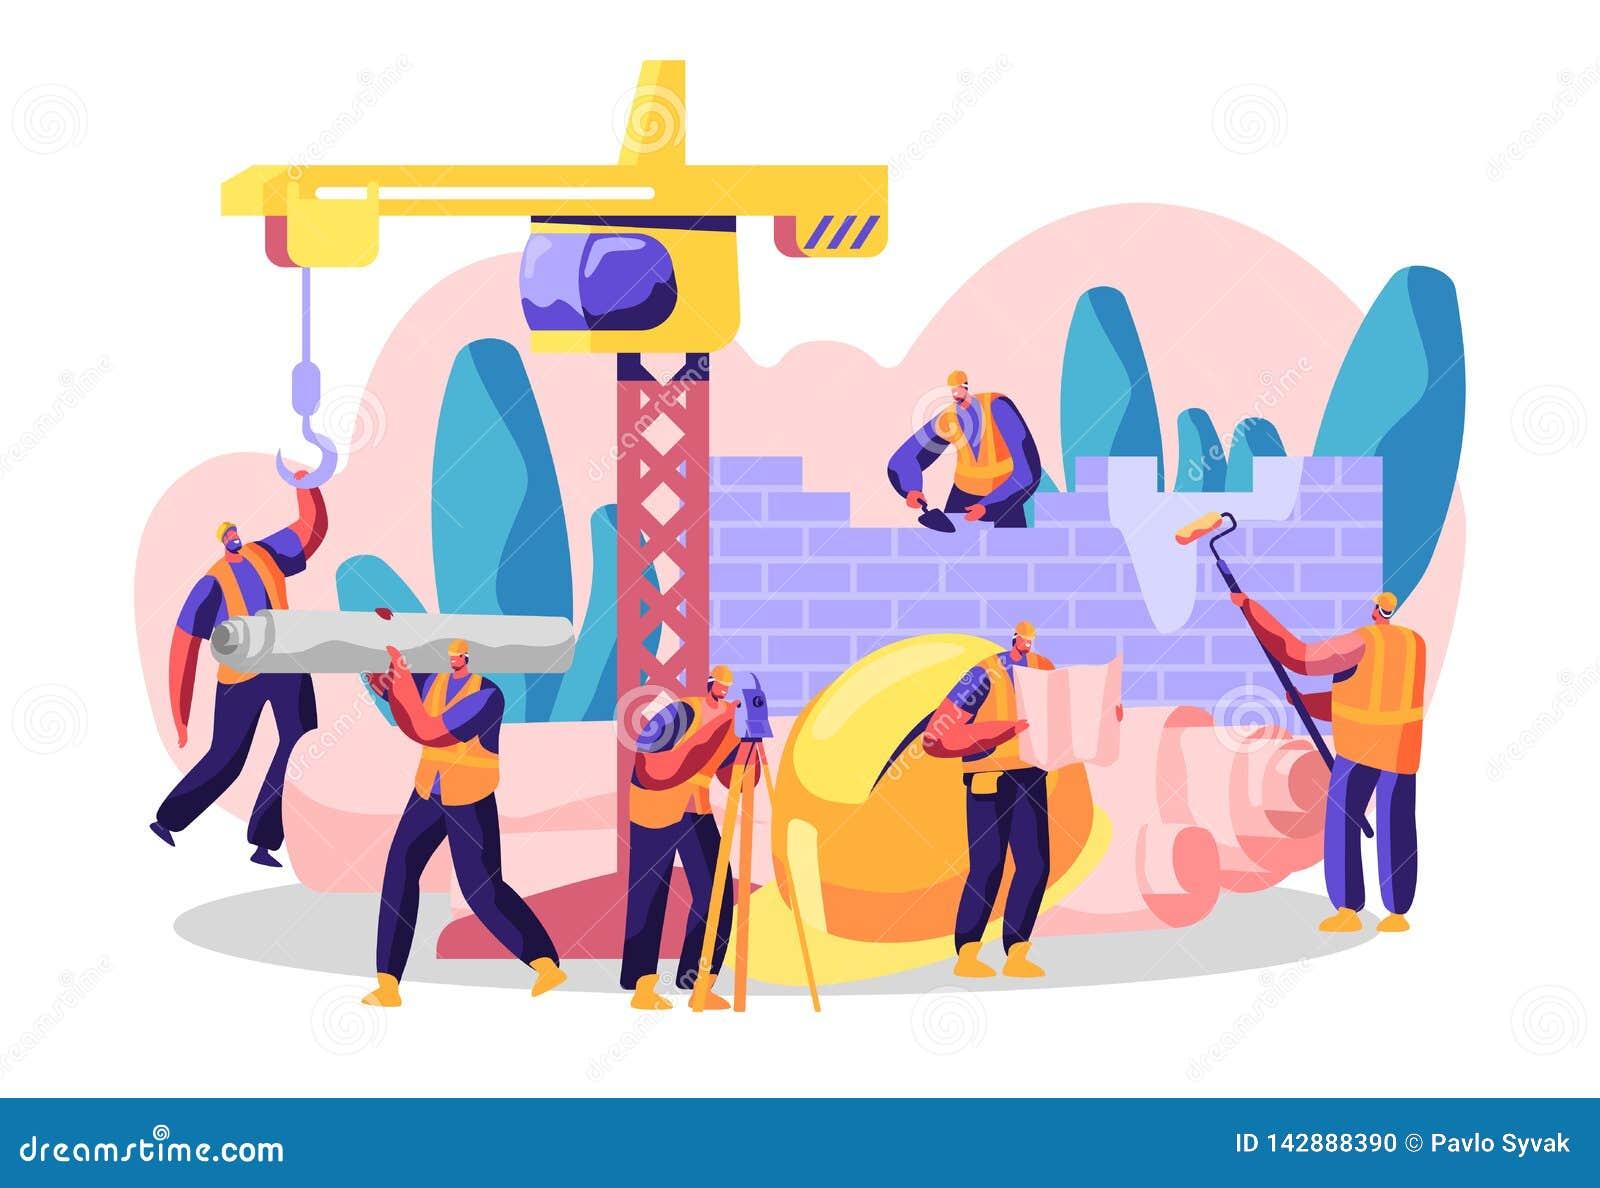 Berufscharakter errichten Neubau, analysieren Plan und Platz, konstruieren Wohnsitz, Gesch?ftszentrum oder Gesch?ft